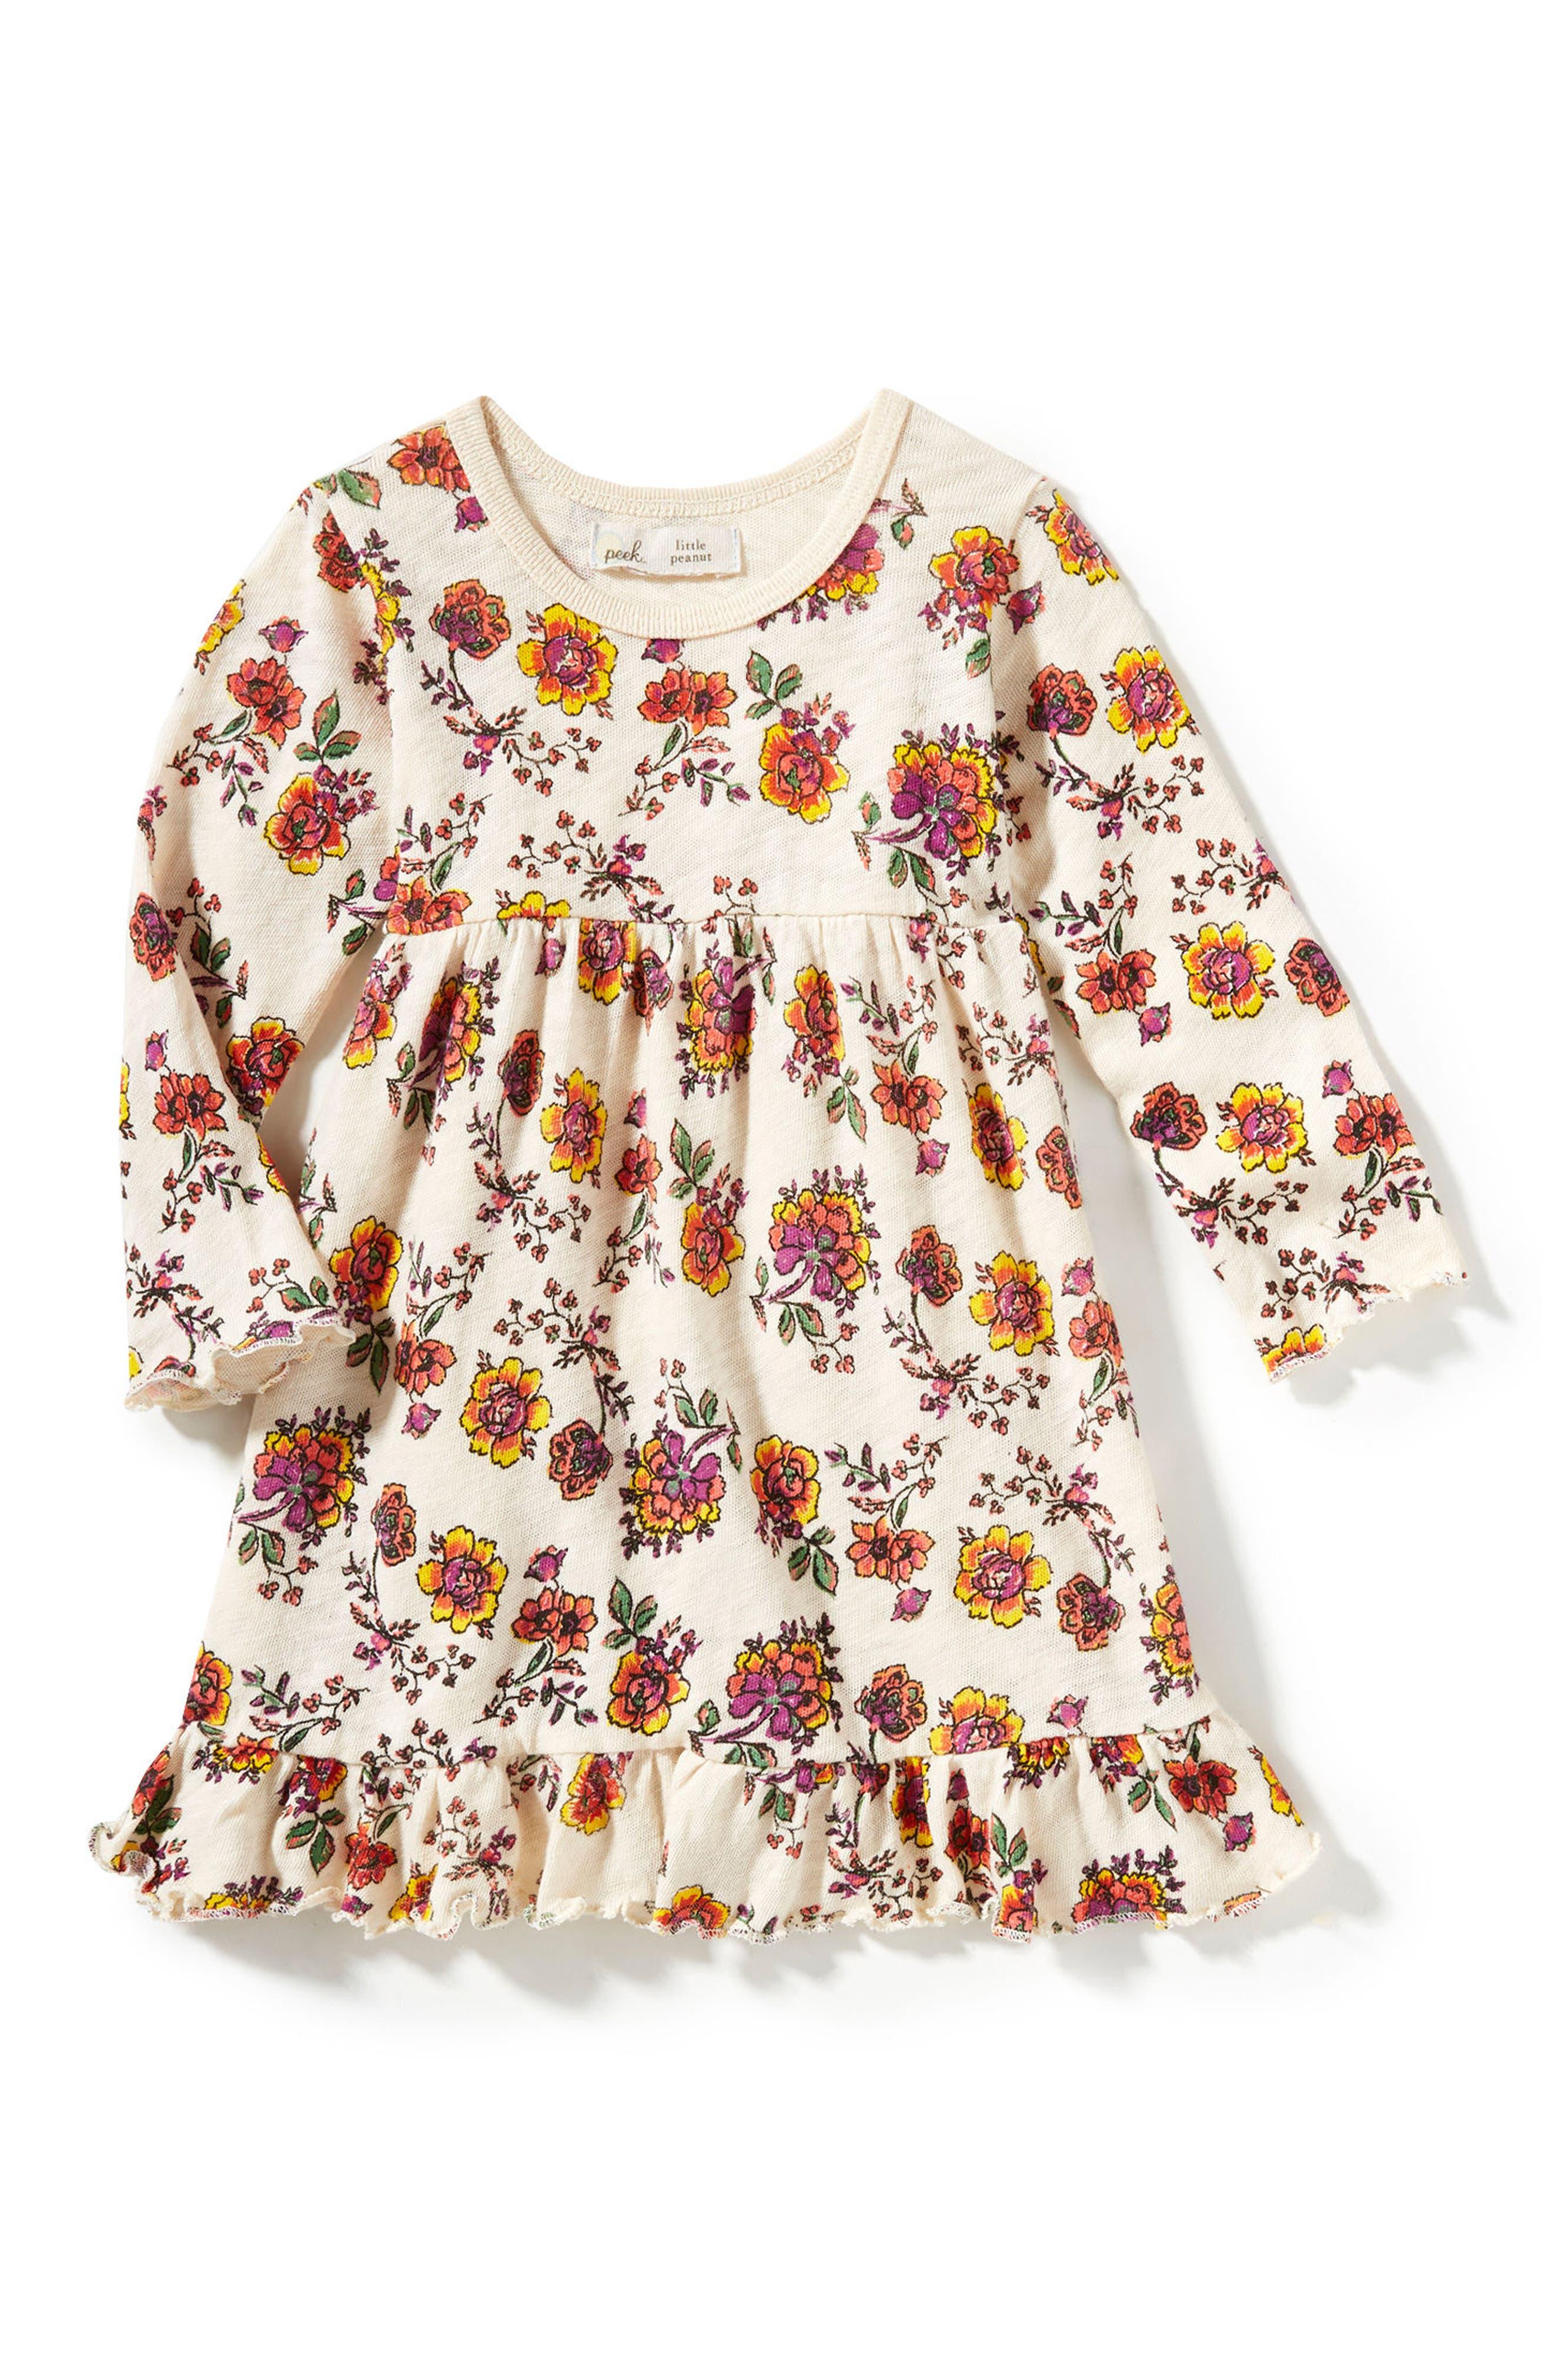 Main Image - Peek Floral Print Dress (Baby Girls)